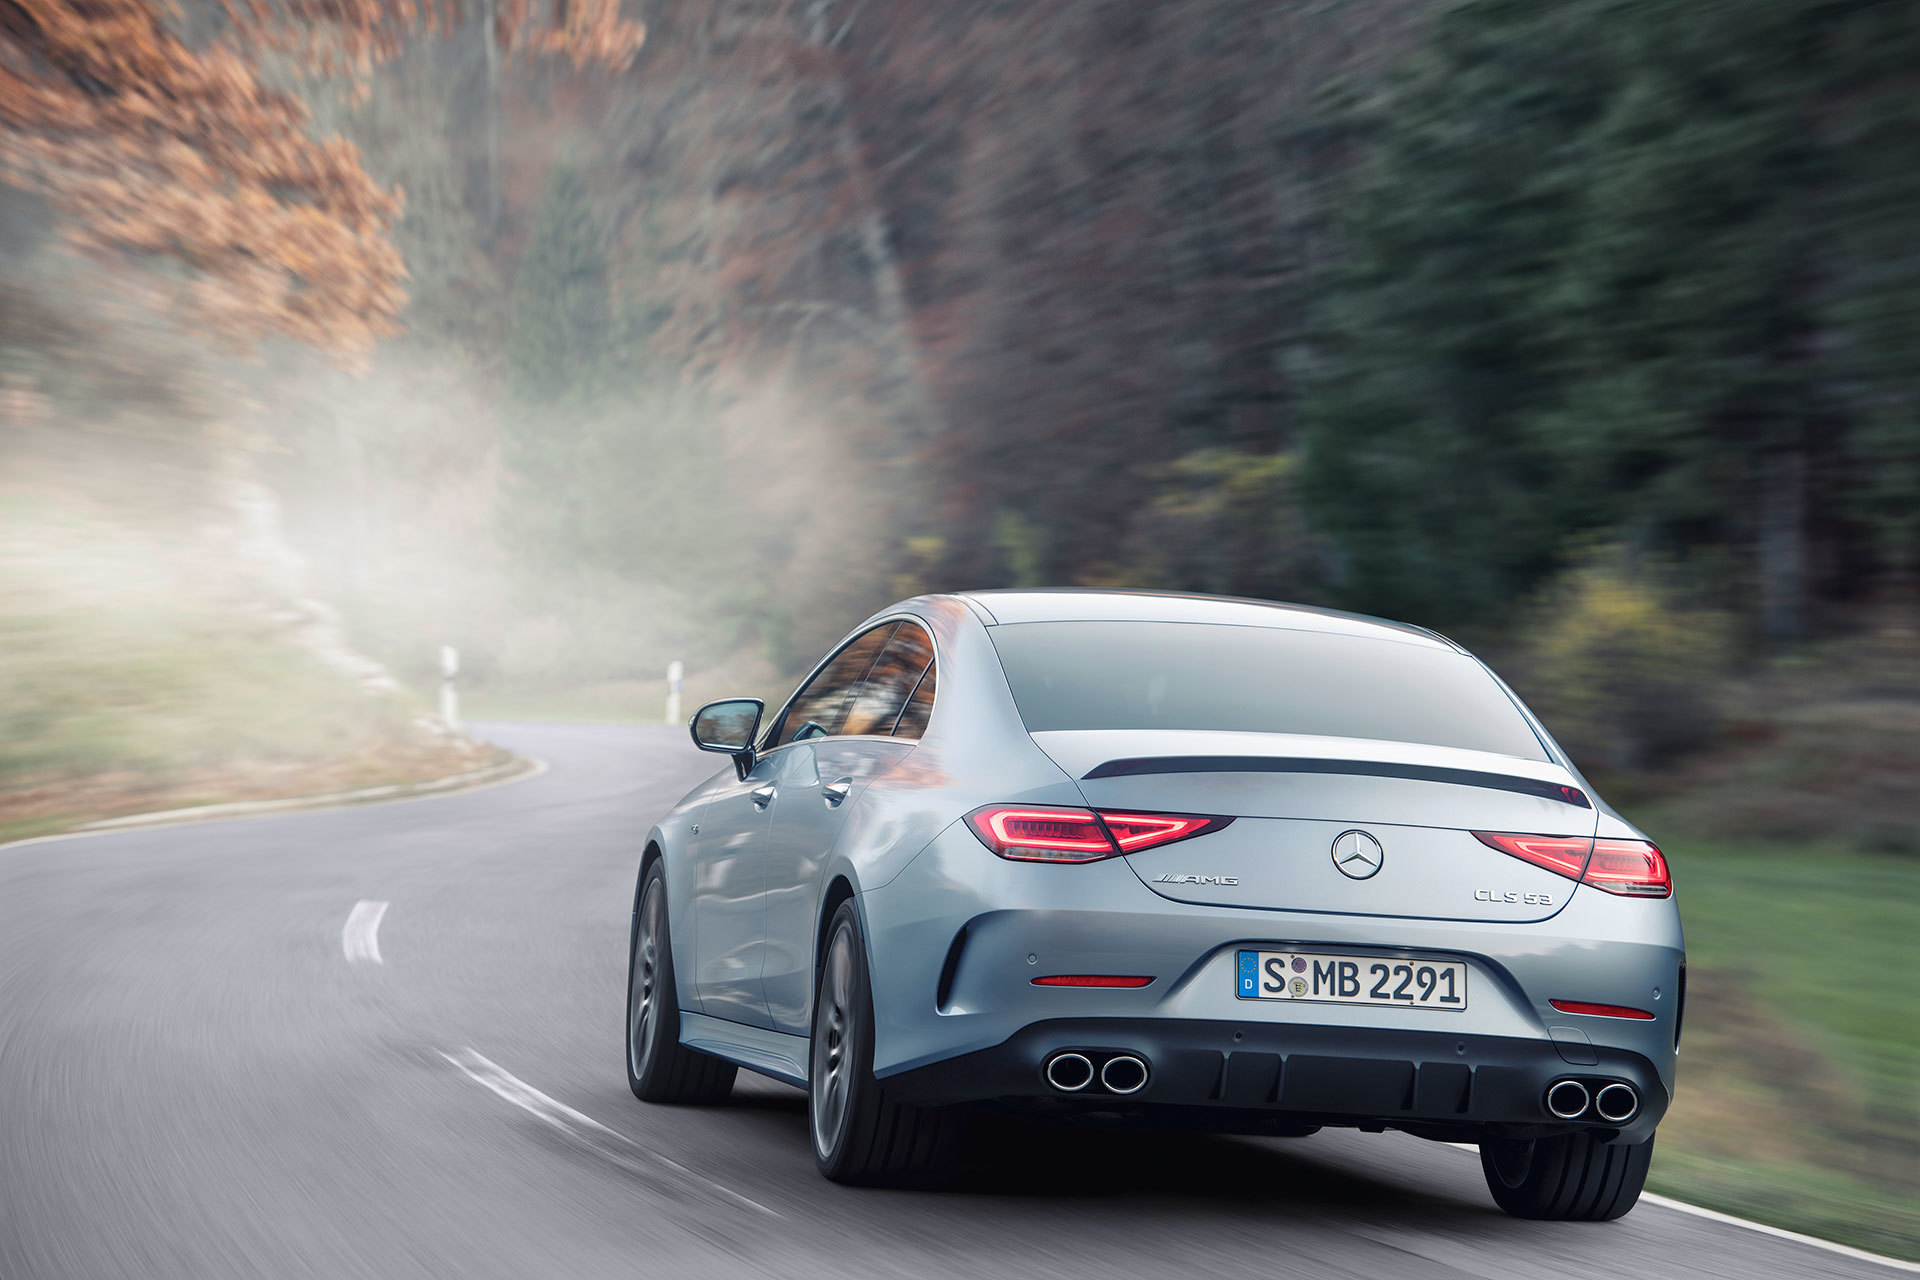 Mercedes Amg Cls 53 4matic 2021 Gris Azul Claro Costa Azul 12